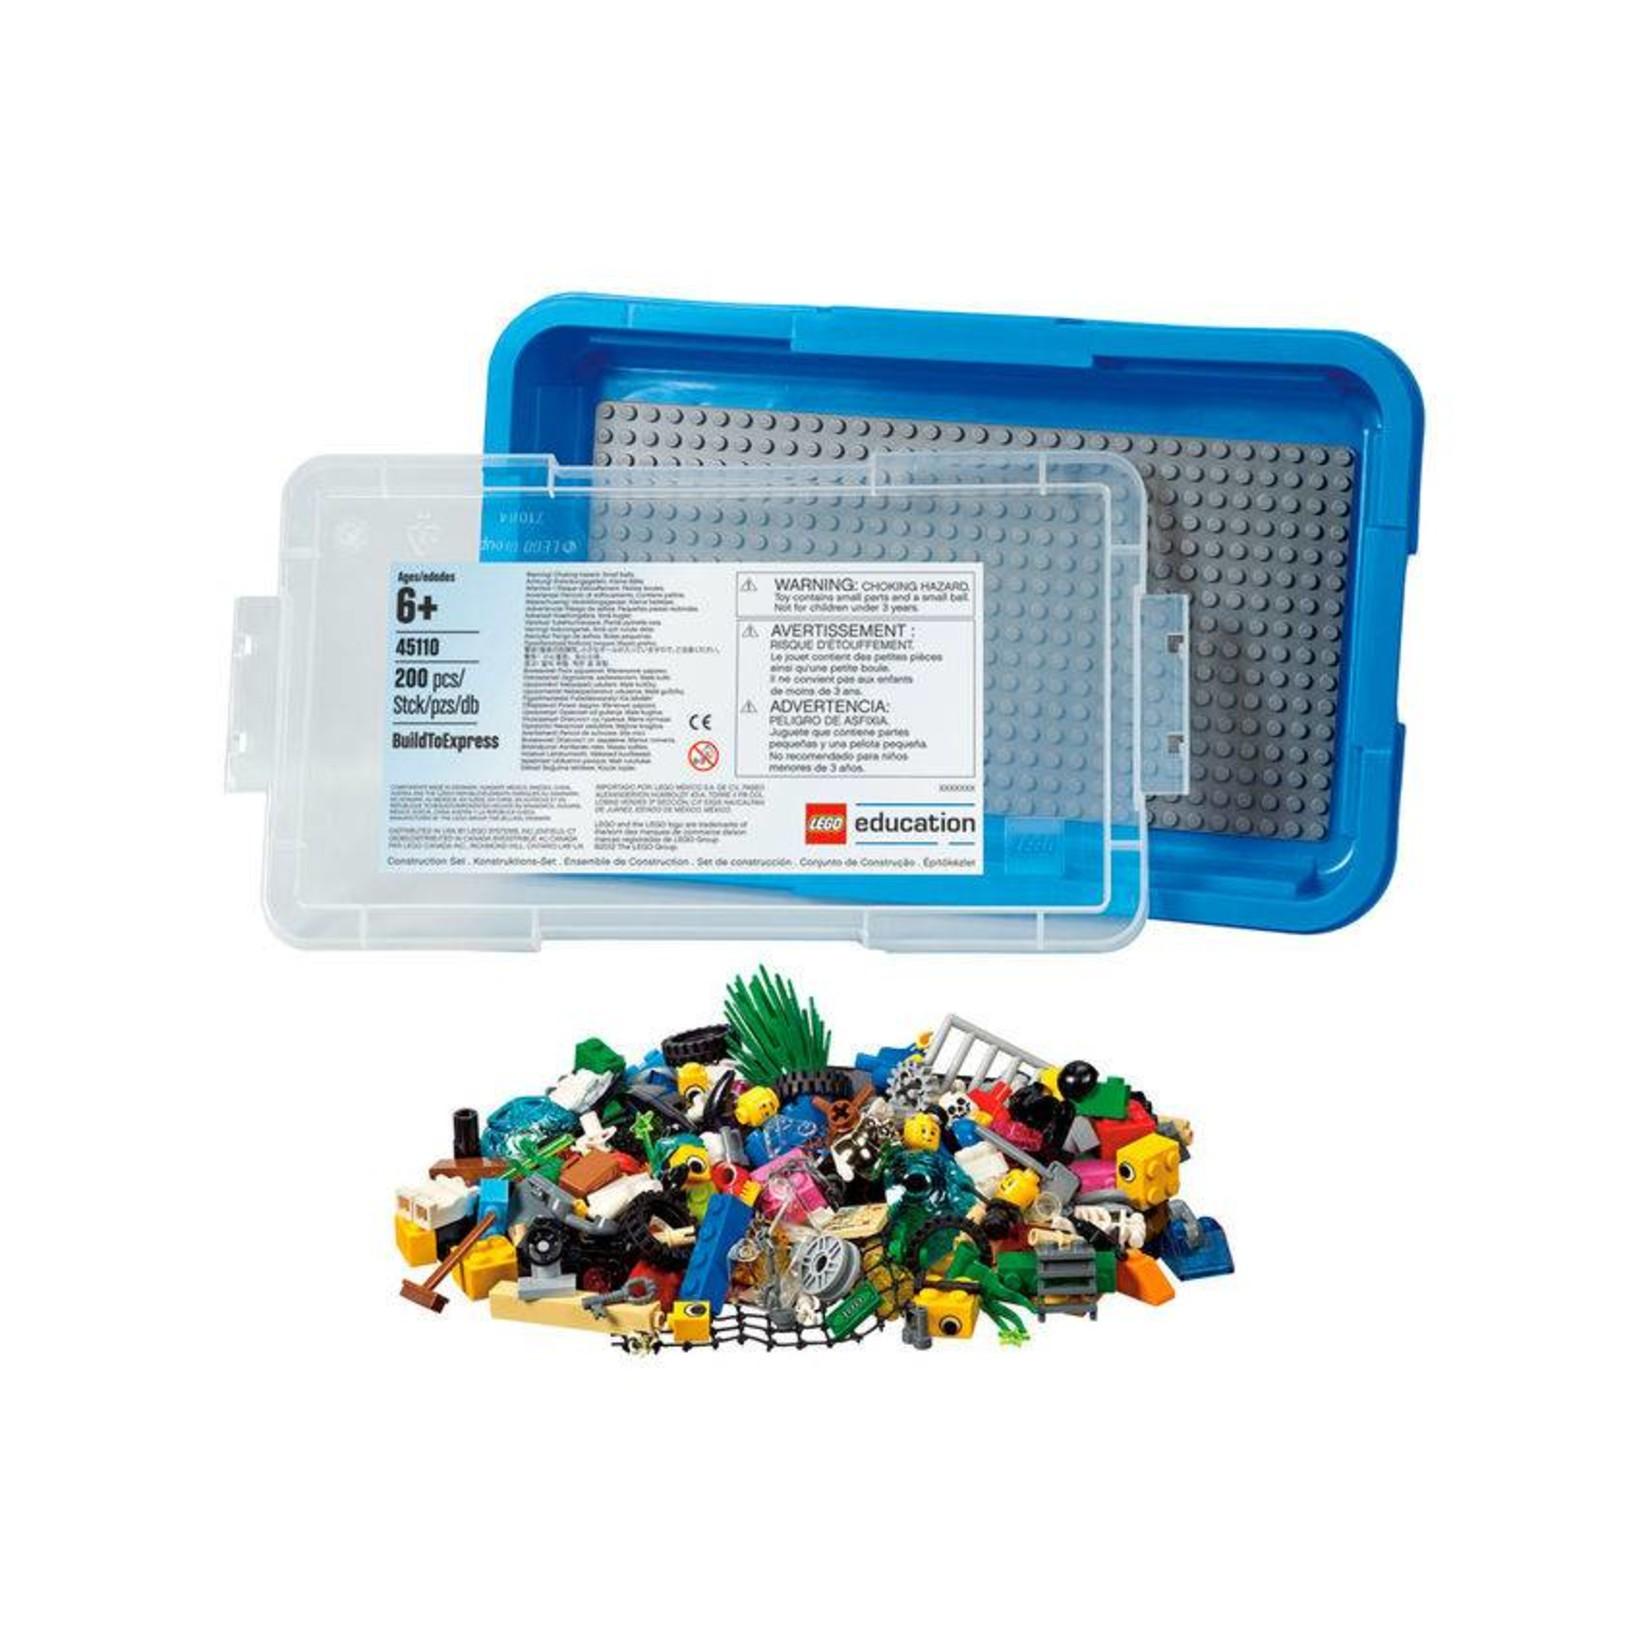 LEGO® Education BuildToExpress Core Set